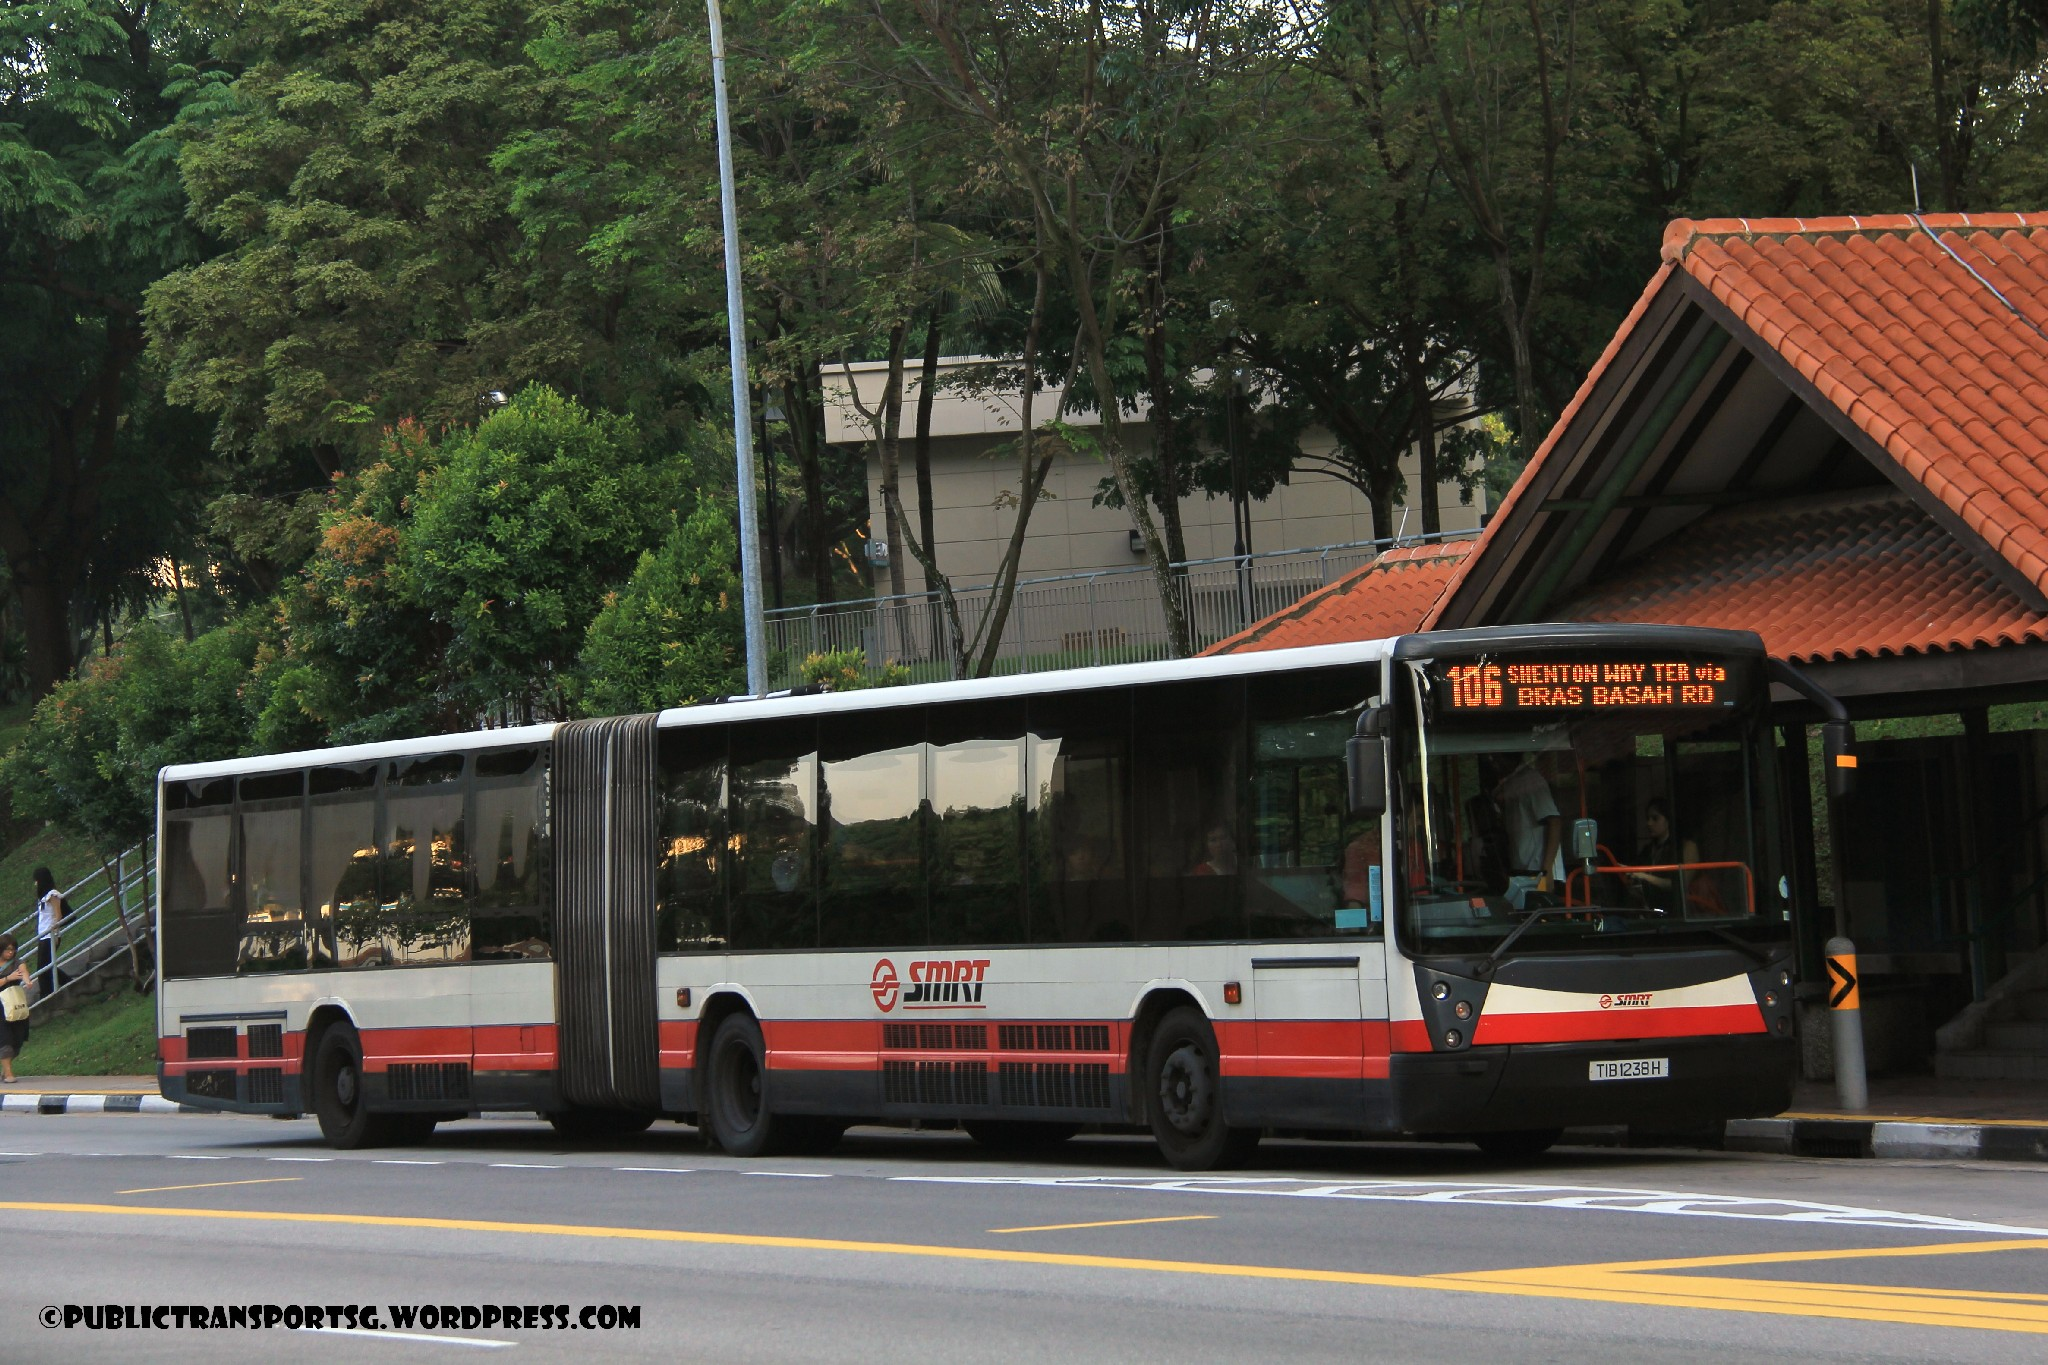 TIB1238H - Service 106 (Mobitec MobiLED)